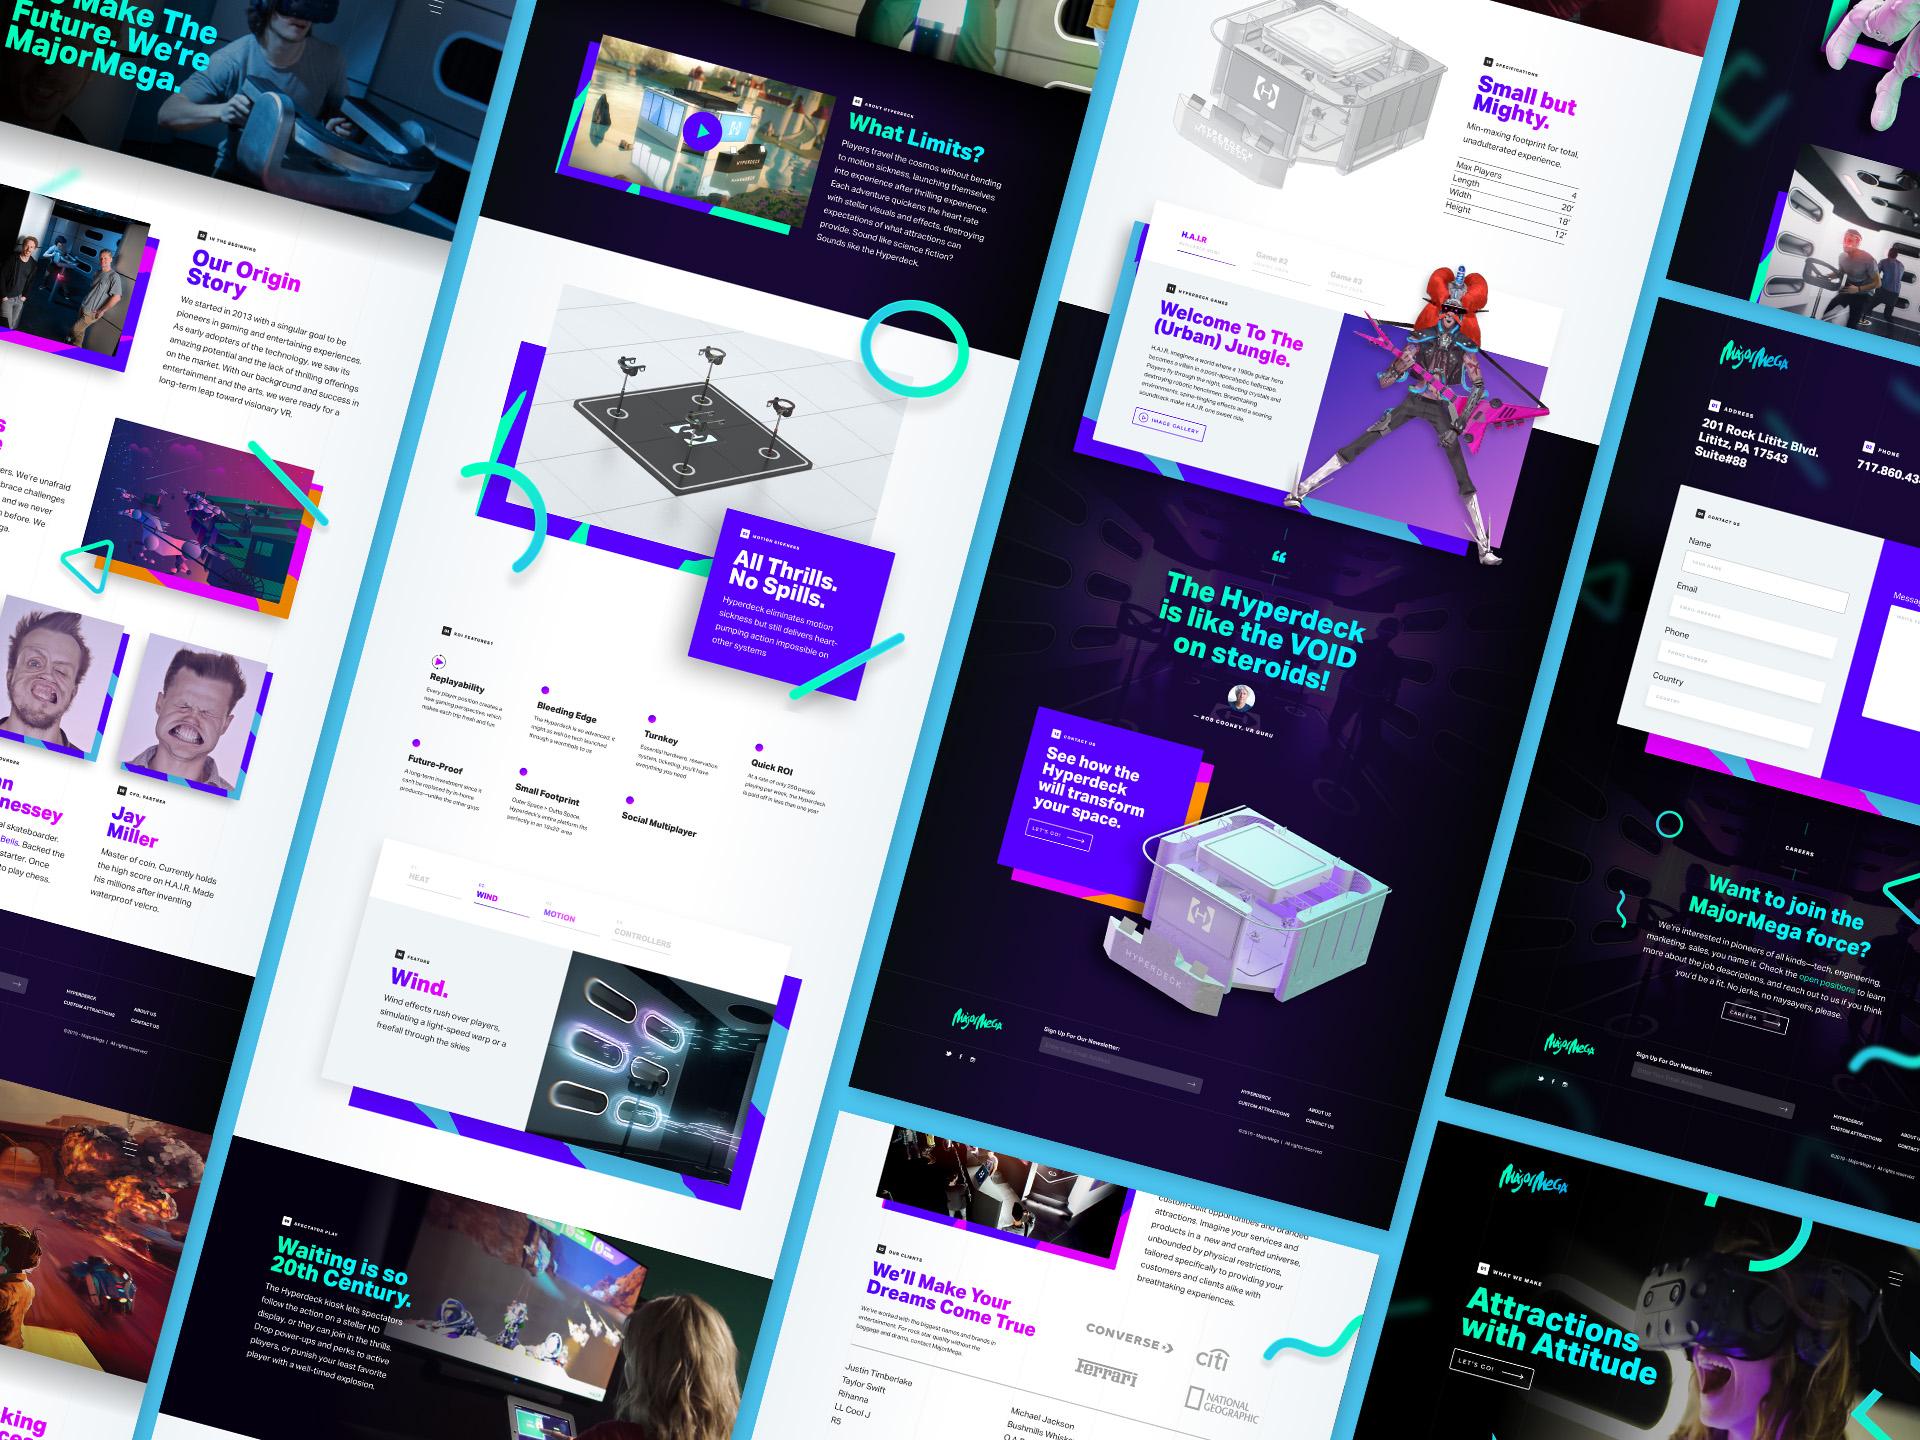 various screenshots of the MajorMega website